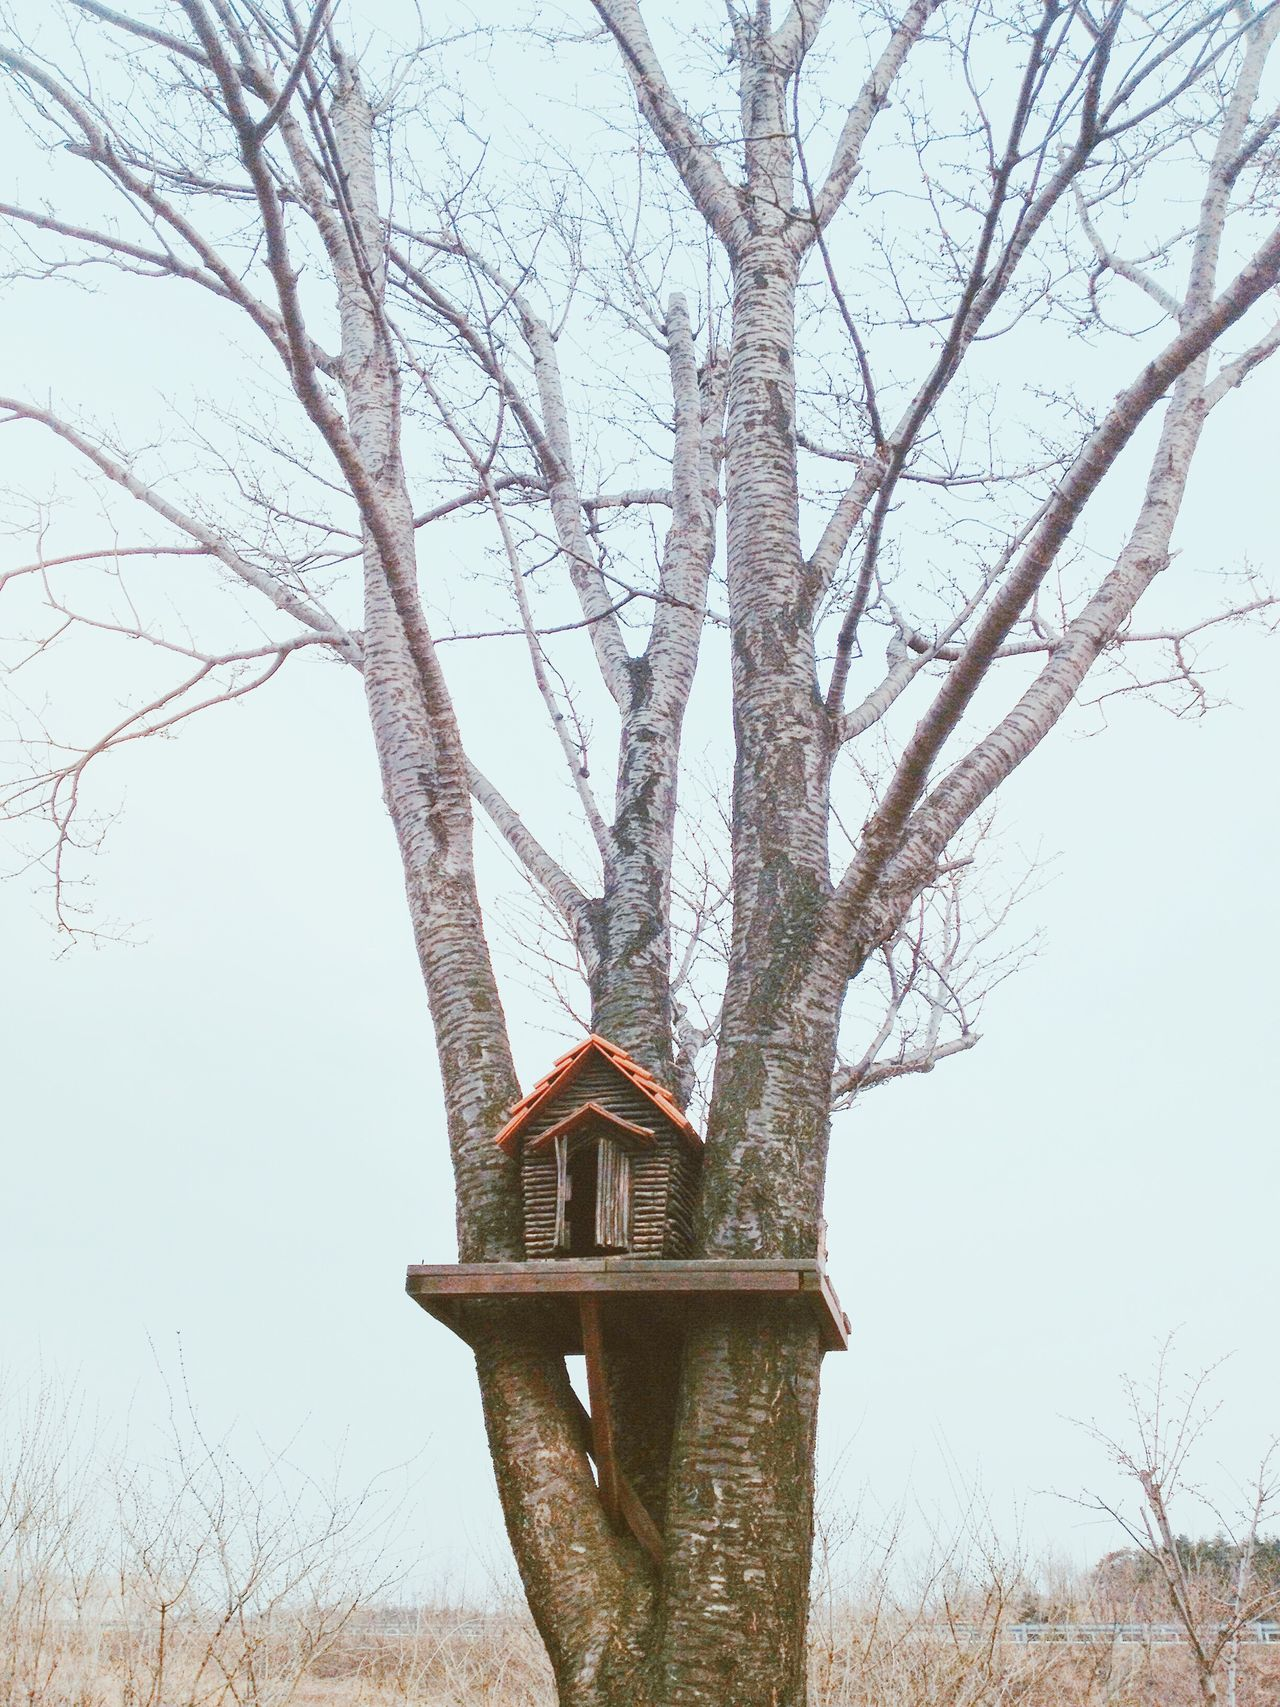 Wood Tree Nest Nature Birdhouse Bird Forest Winter House Box Hole Outsde Wooden Habitat Feed  Feeder Sky EyeEmNewHere EyeEmNewHere